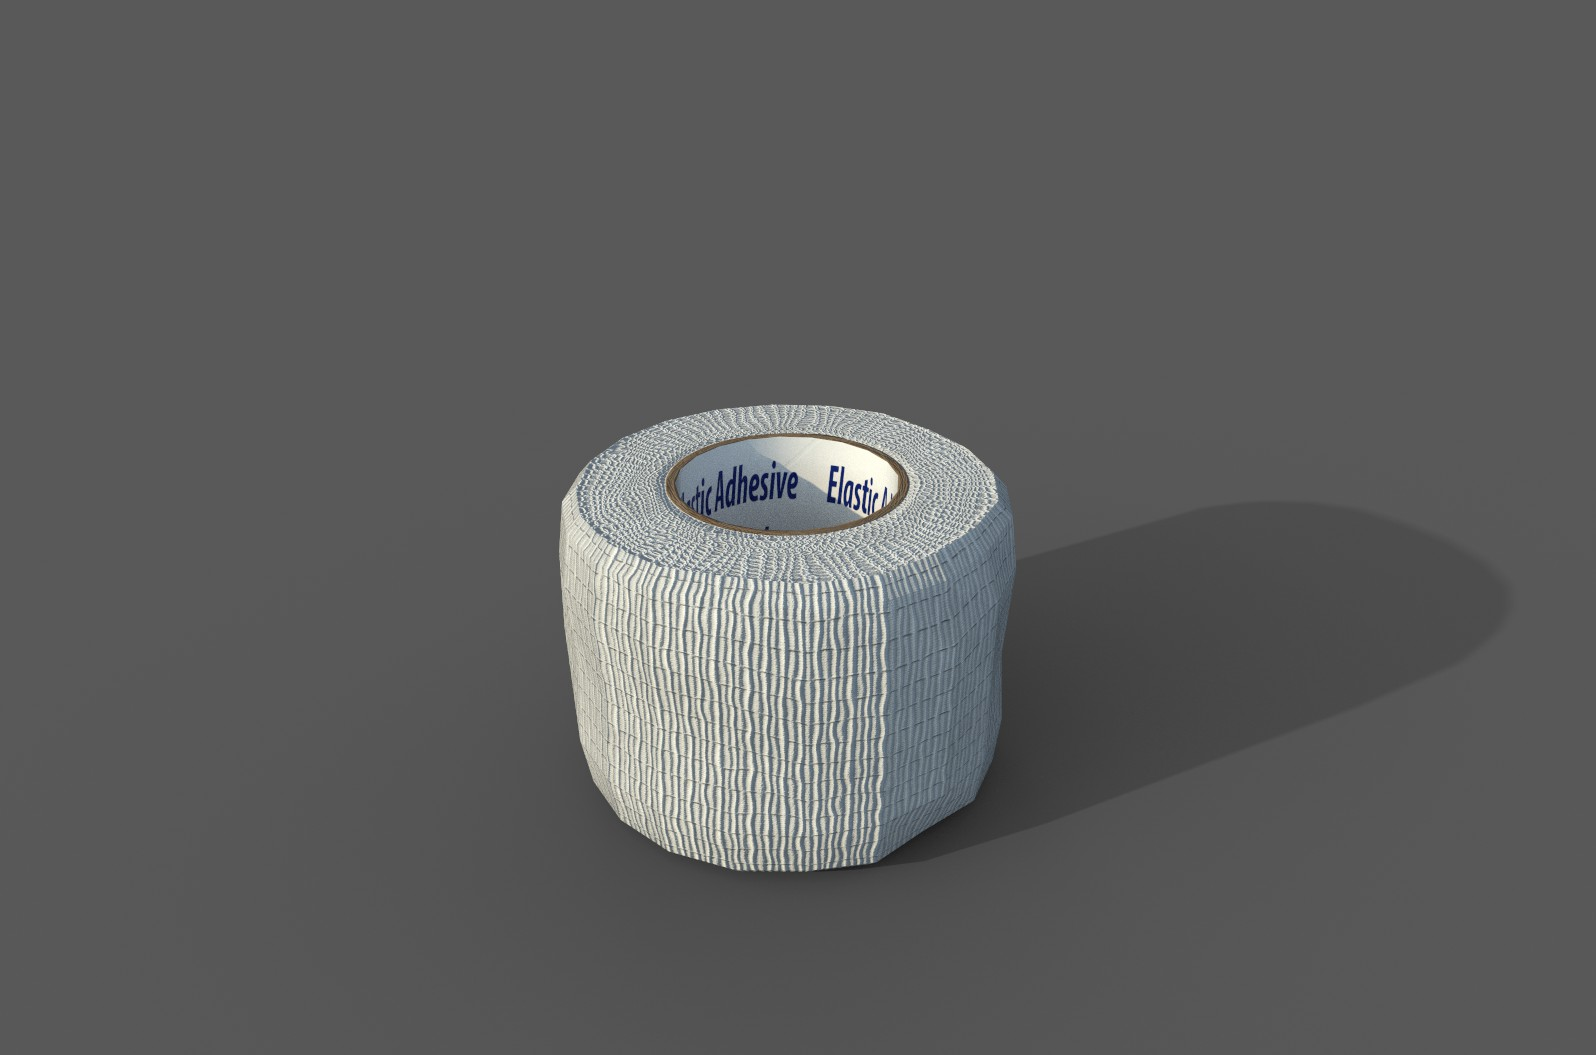 bandageRoll_1.jpg